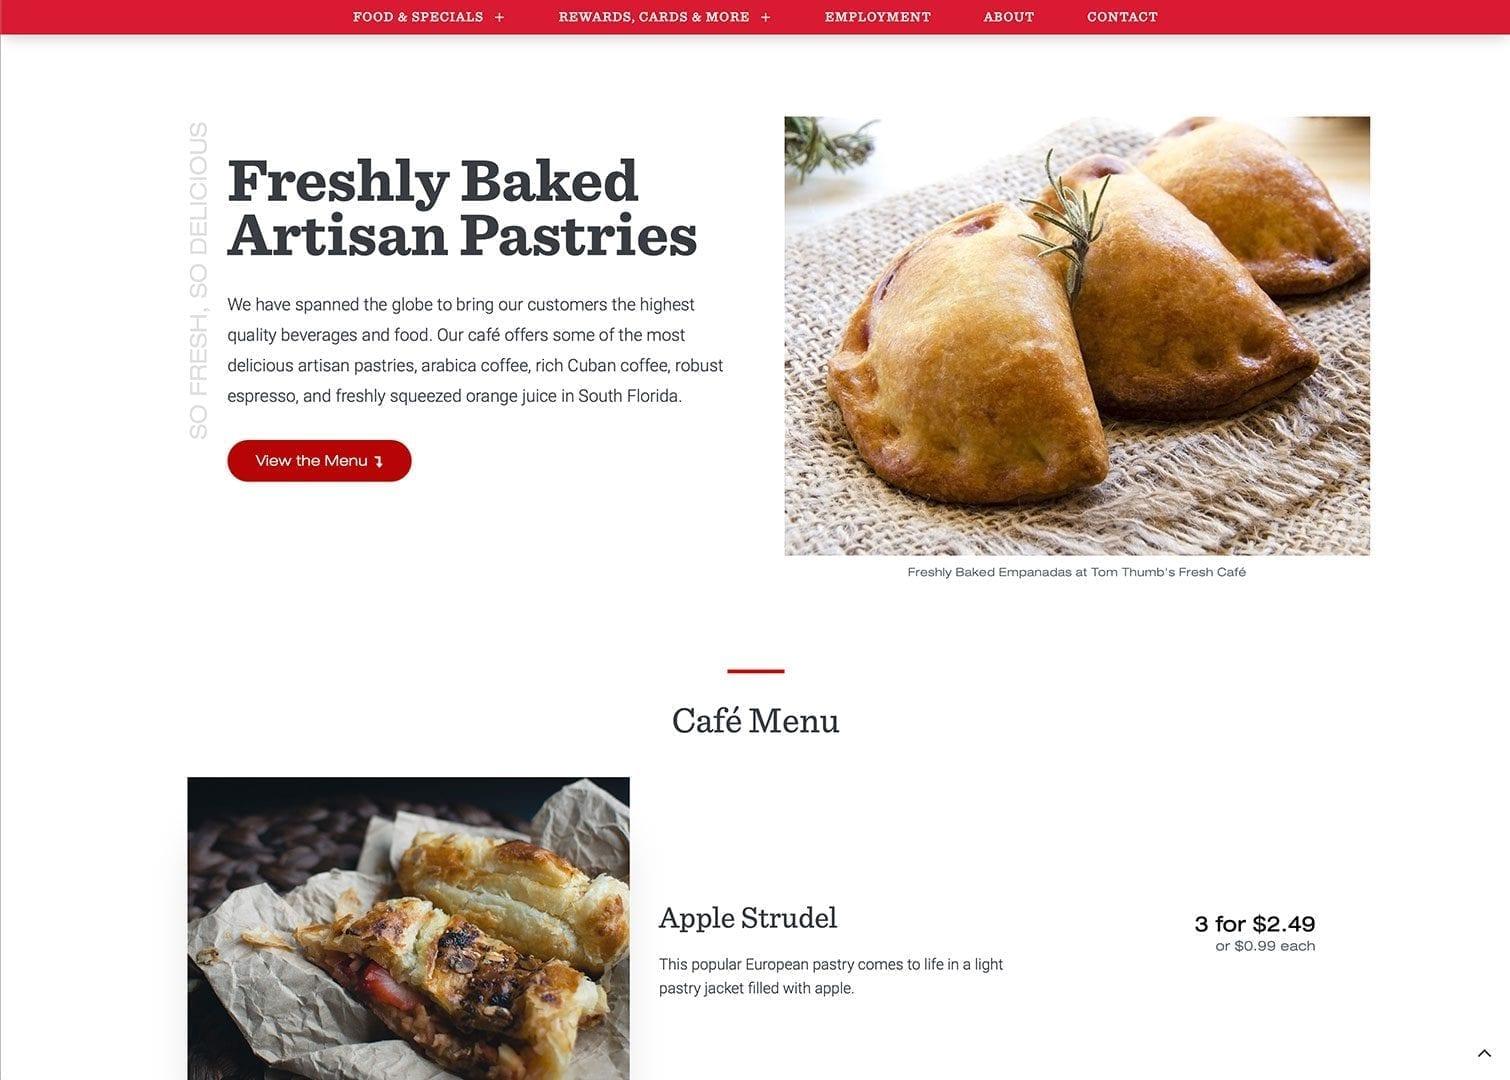 Café Menu - mytomthumb.com - sliStudios Web Development